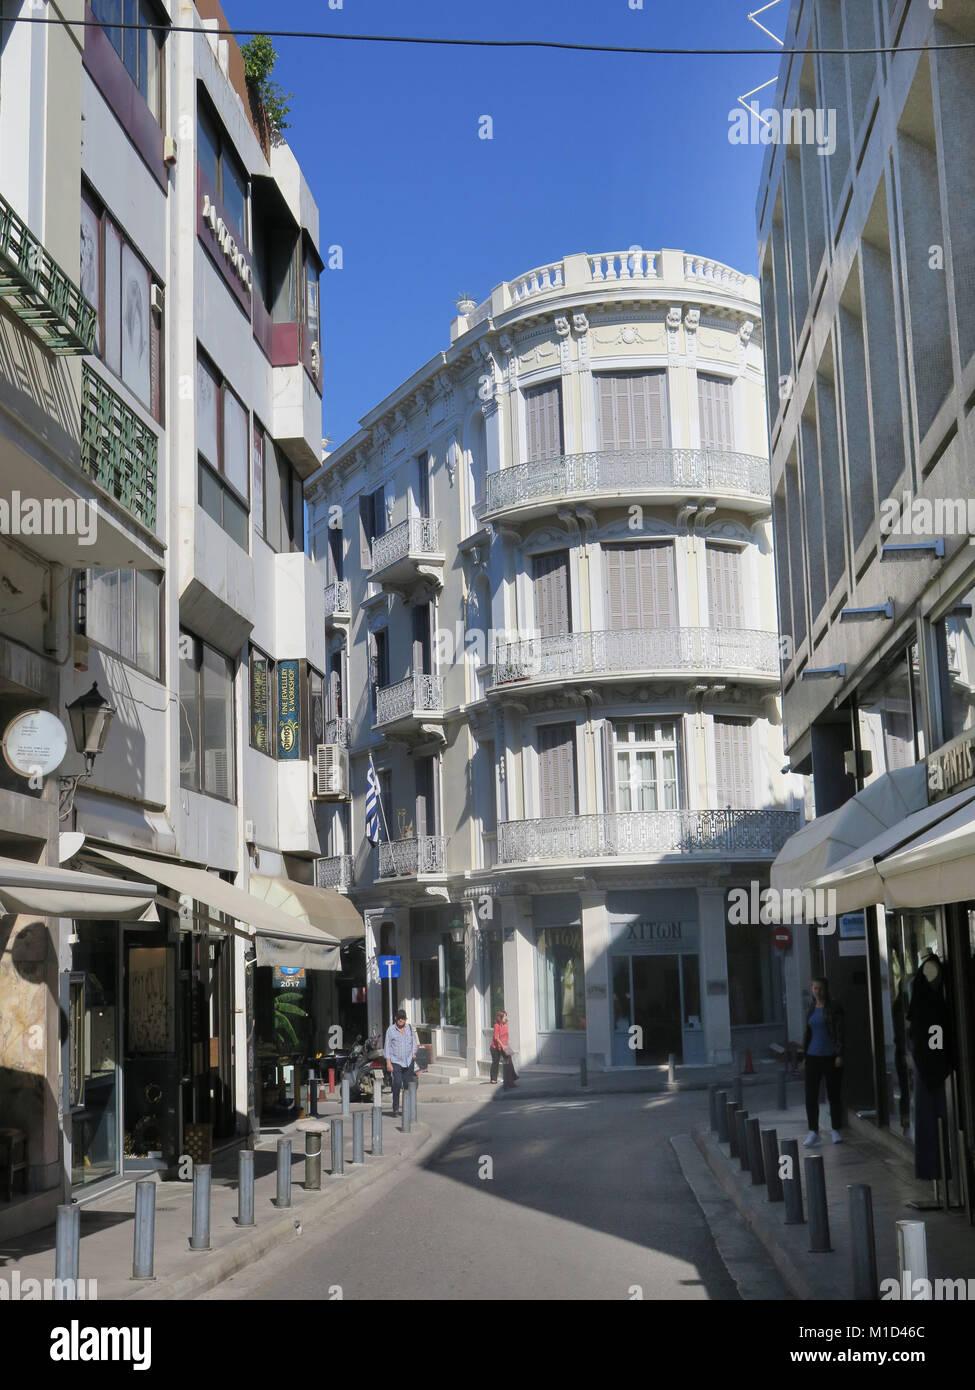 Gasse, Altstadt, Bezirk Plaka, Athen, Griechenland - Stock Image